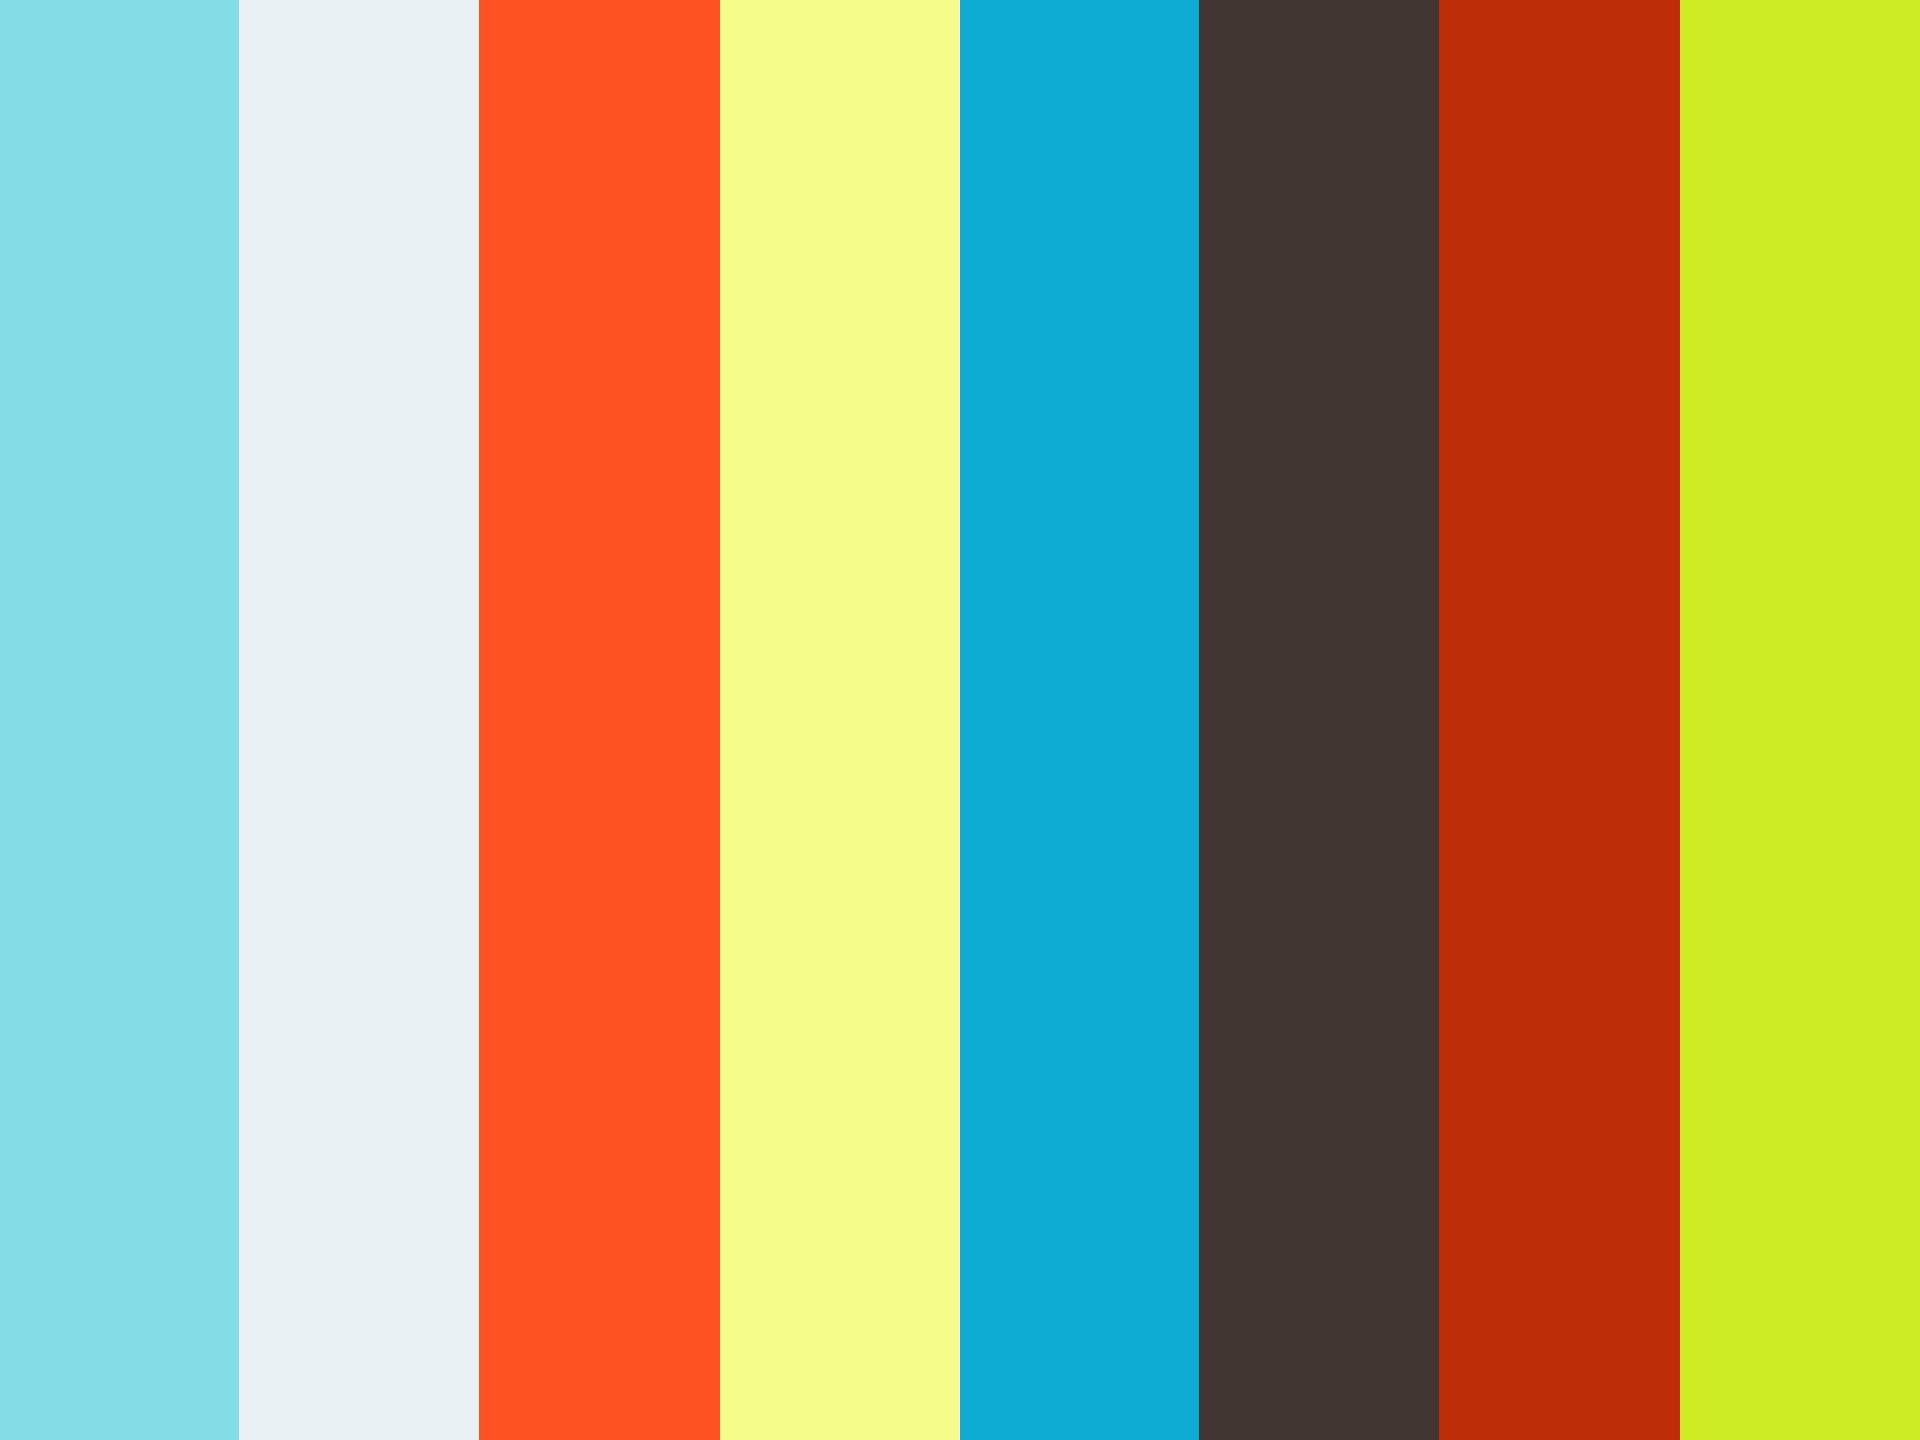 MERCEDES-BENZ GLE 350 - WHITE - 2017